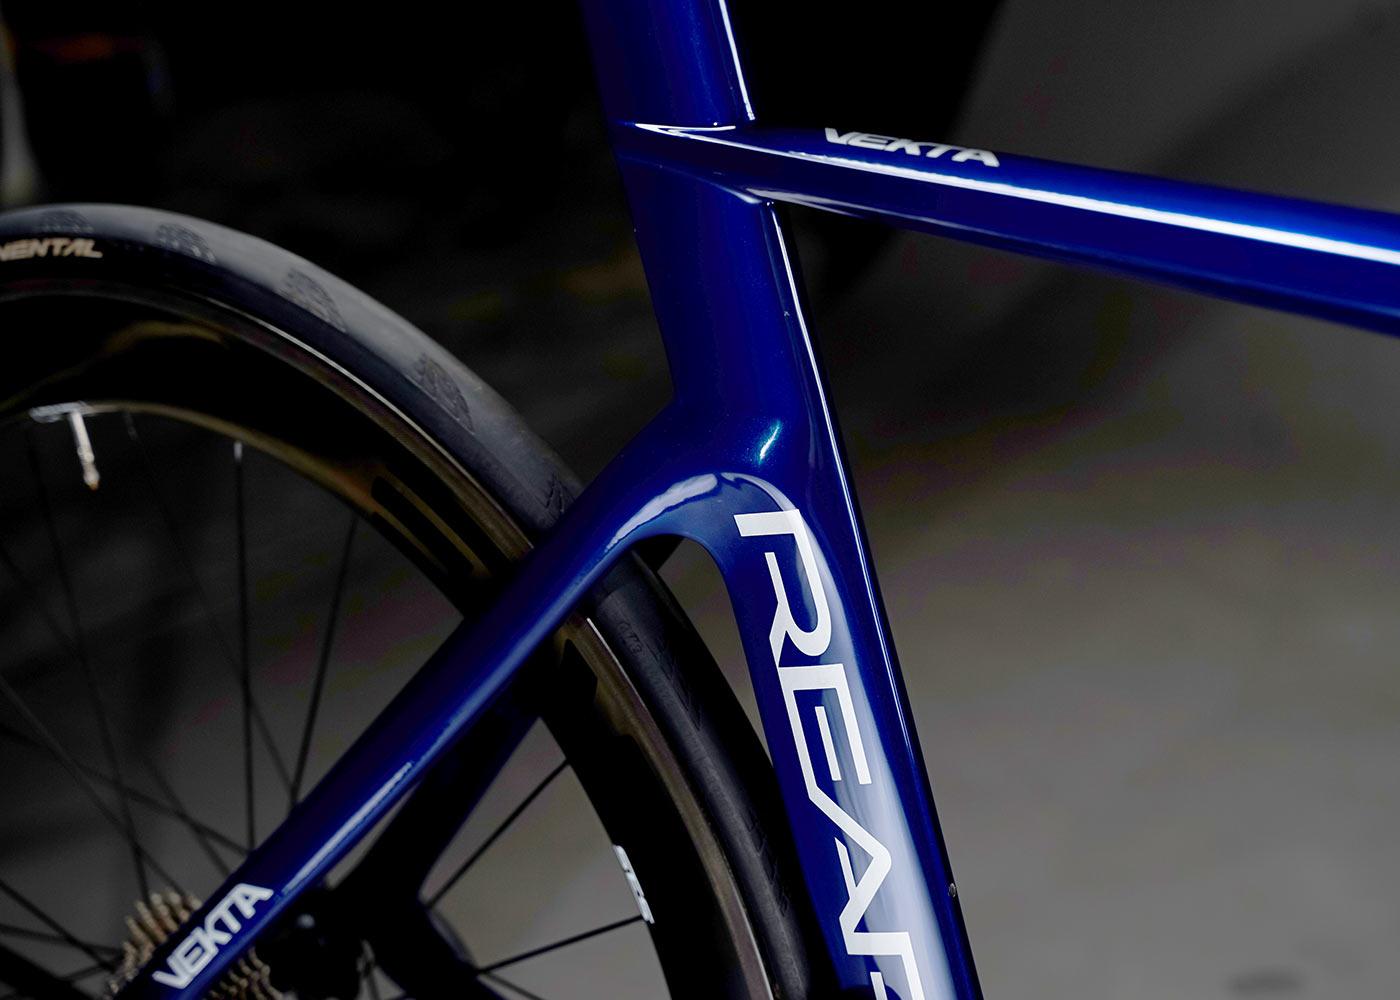 reap vekta aero road bike closeup frame details of seat tube and seatstays